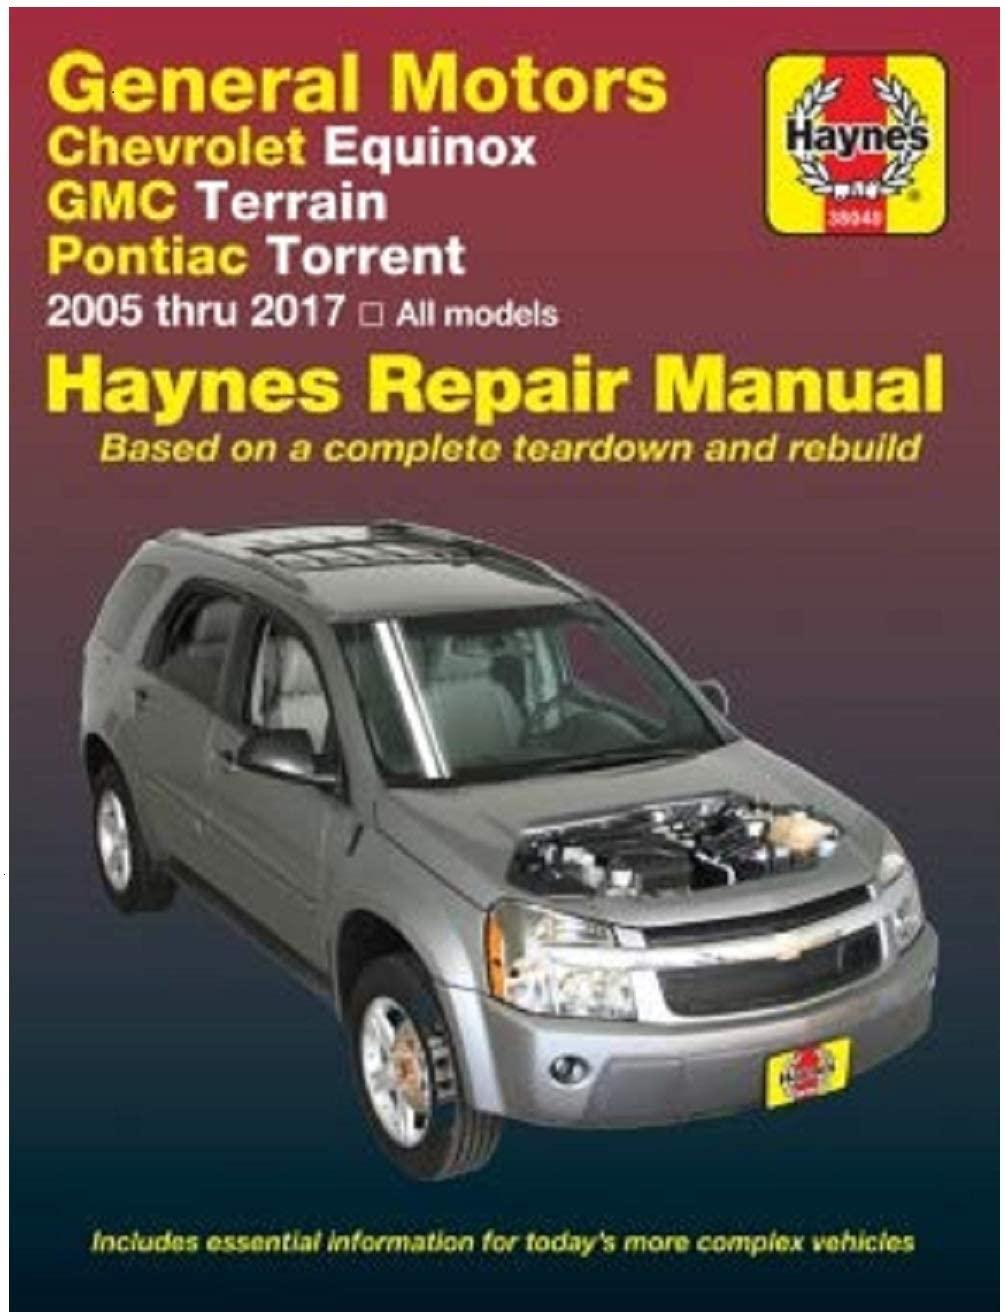 2012 Gmc Terrain Repair Manual Pdf